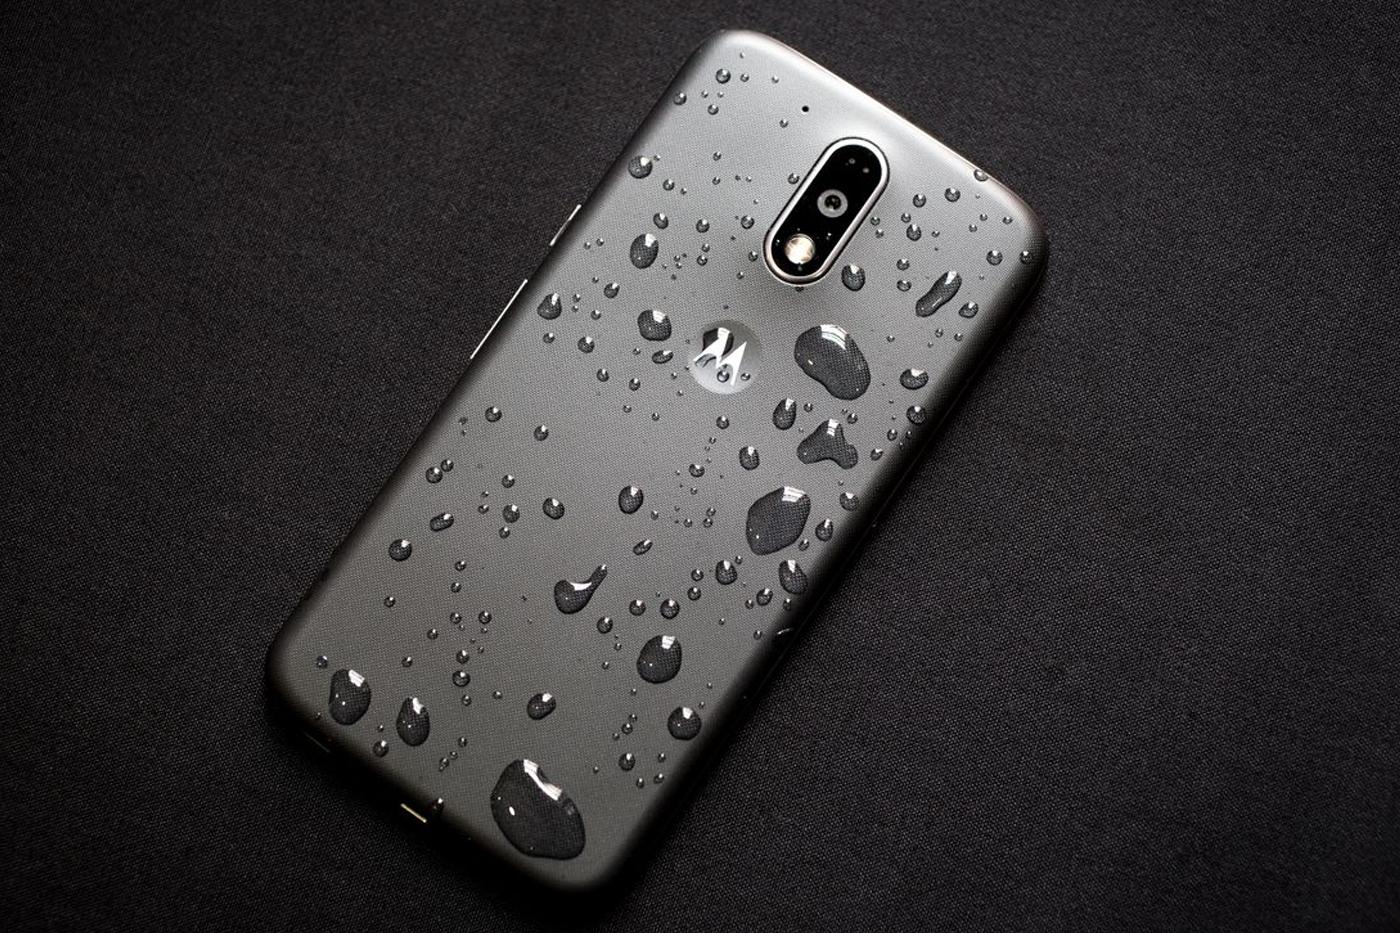 Moto G waterproof